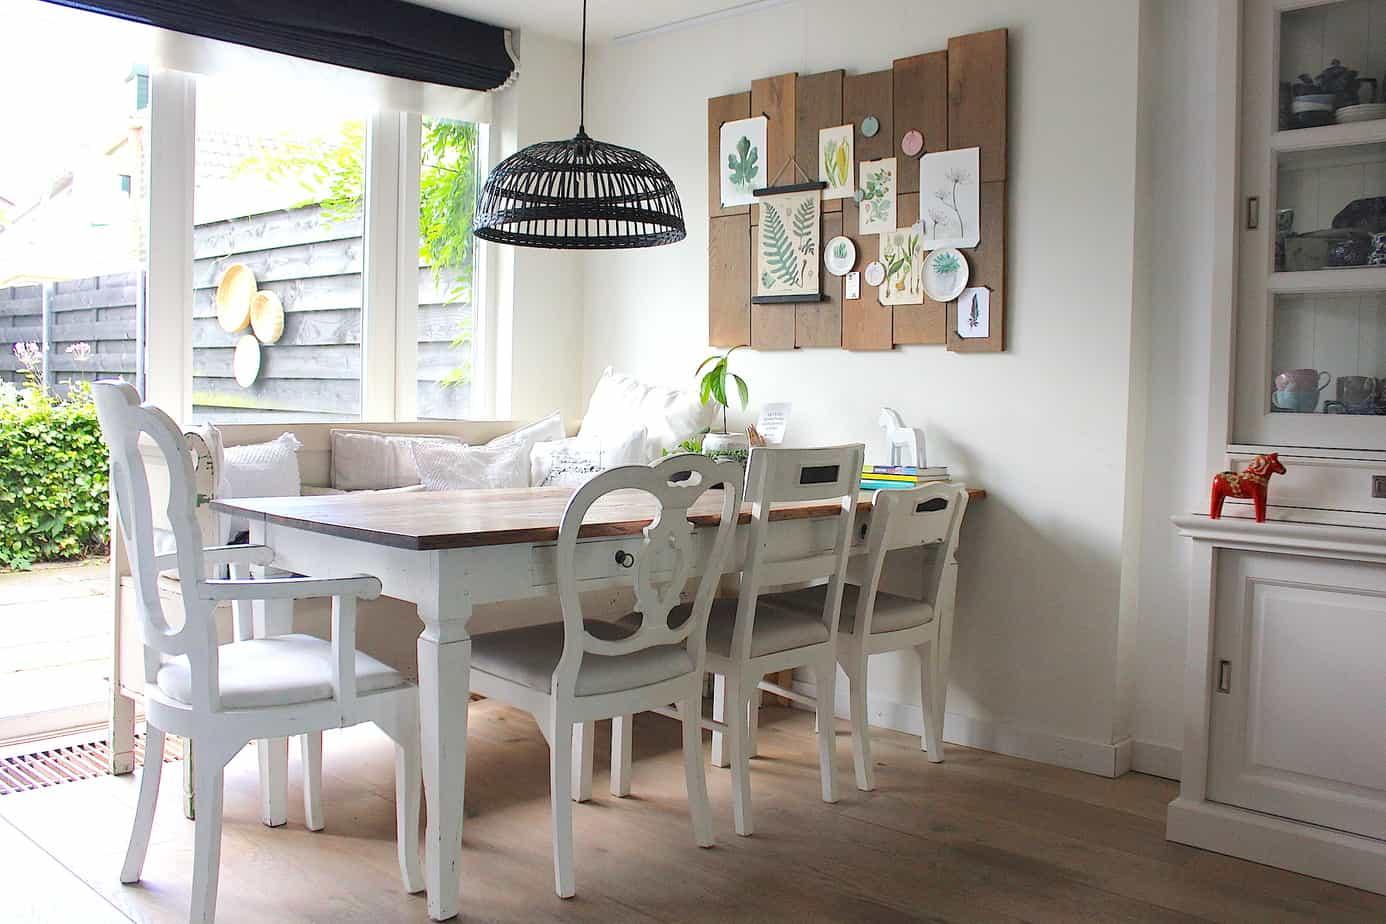 Diy Planken Inrichten : Diy botanisch wandbord enjoy the good life